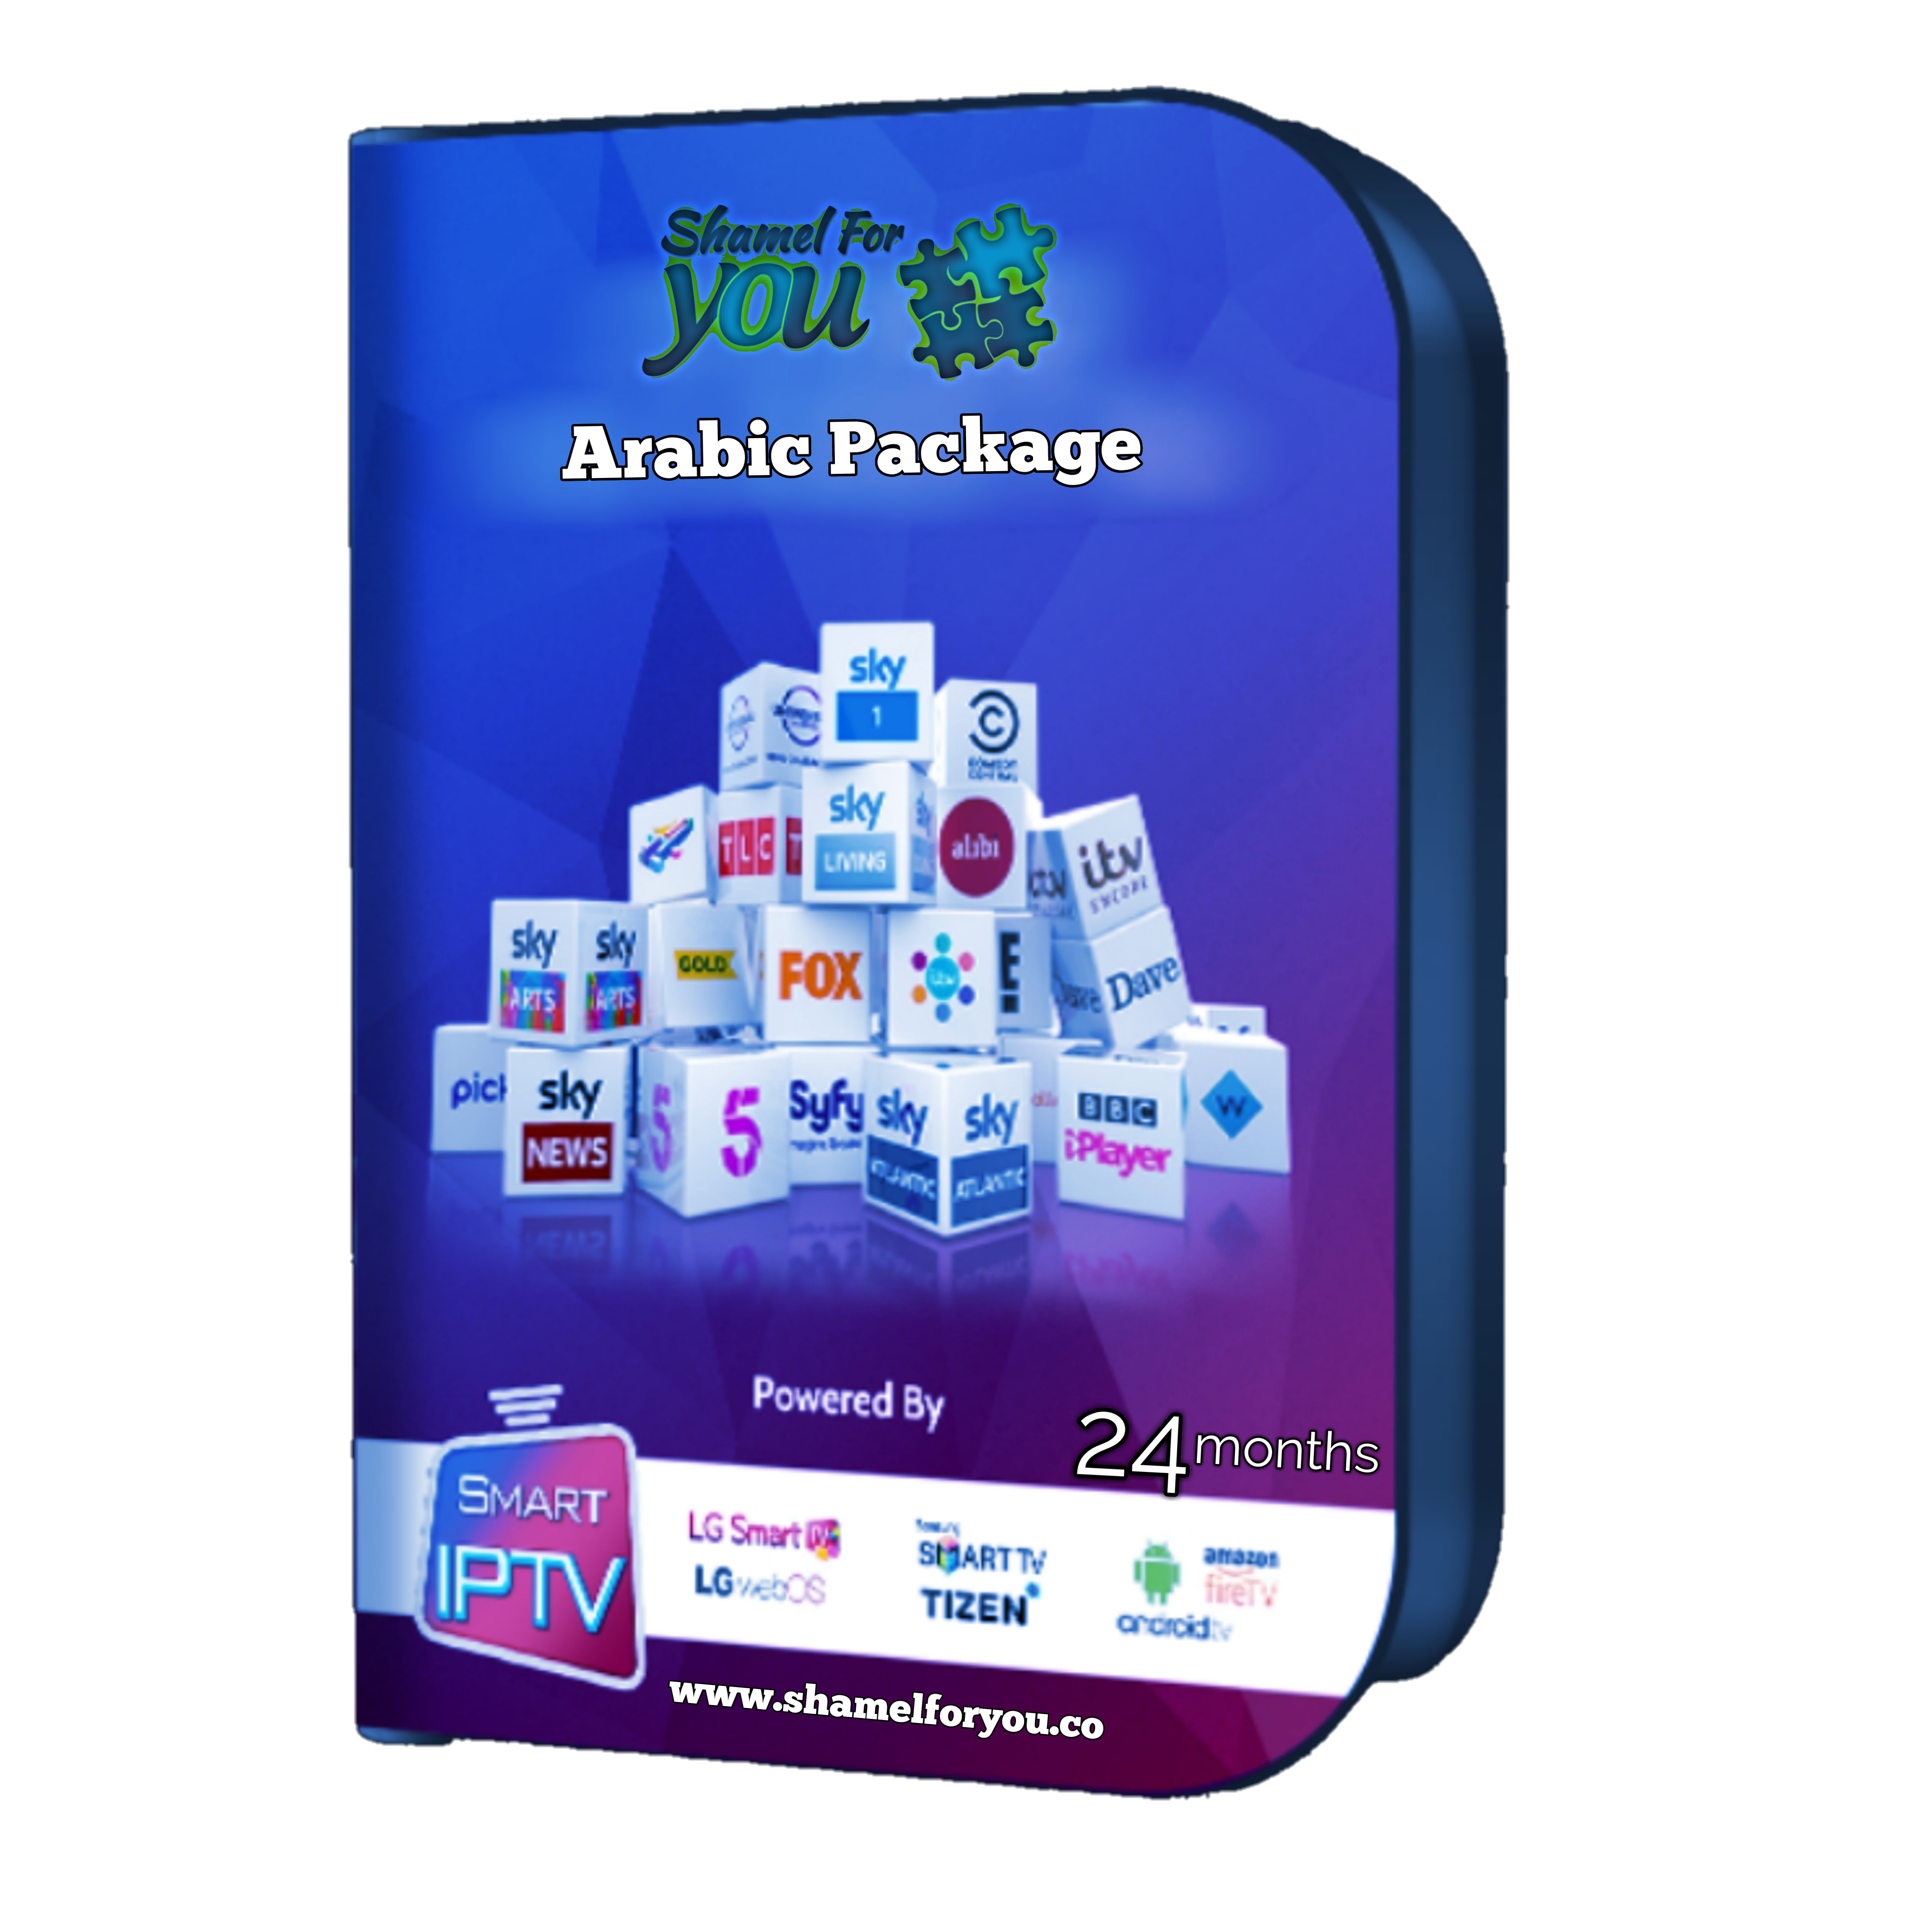 IPTV Shamel 4 You 24 months arabic 00355